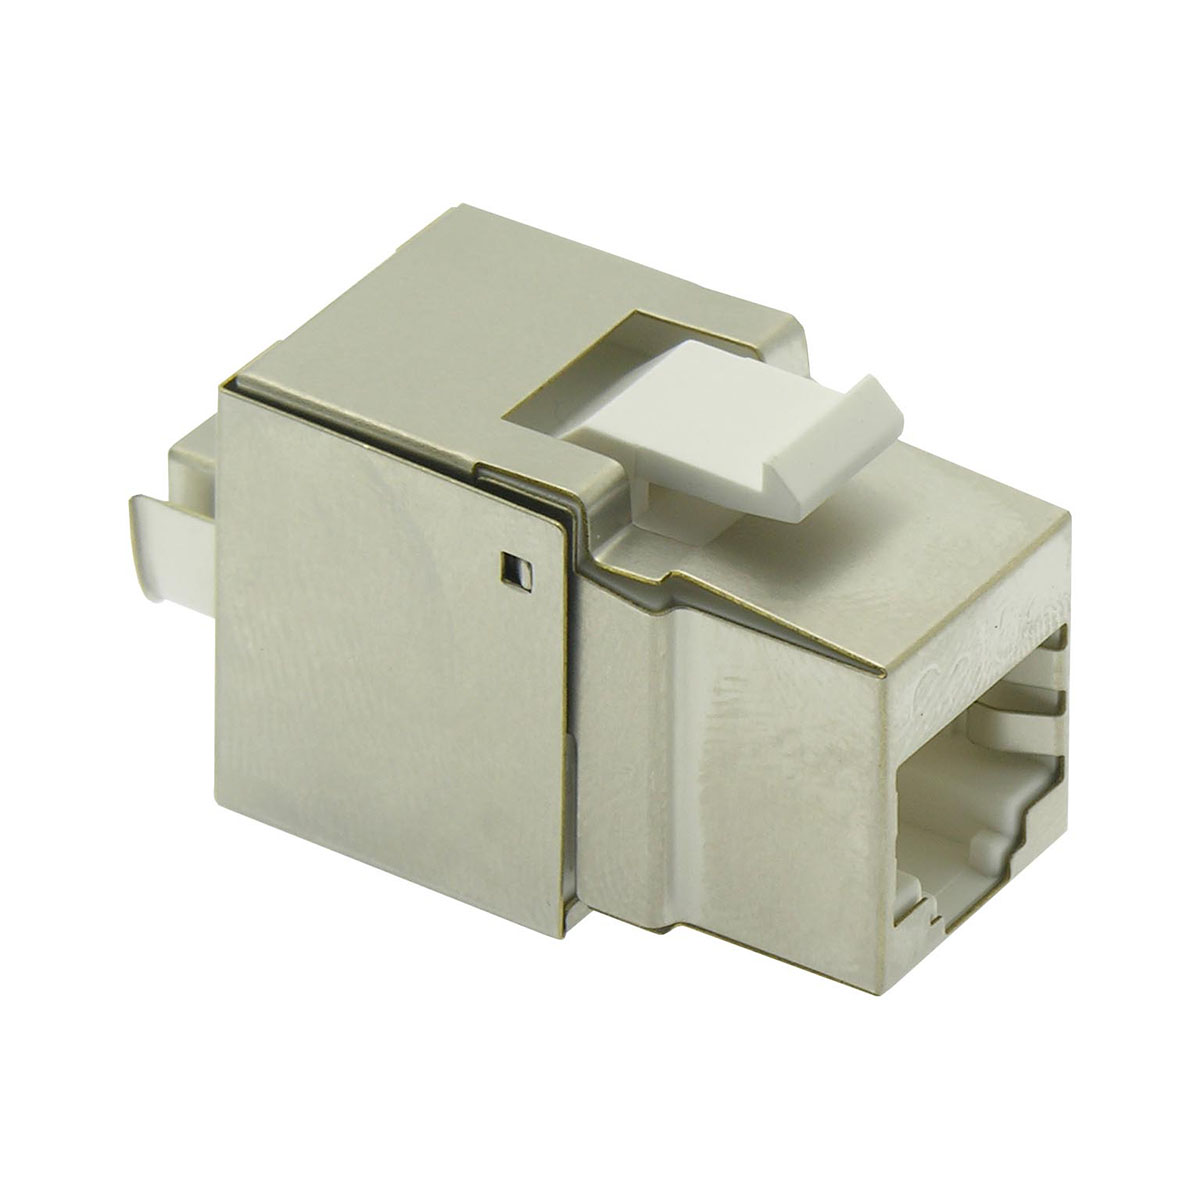 hight resolution of cat5 rj45 110 type shielded keystone jack open pdc bl cats 101608